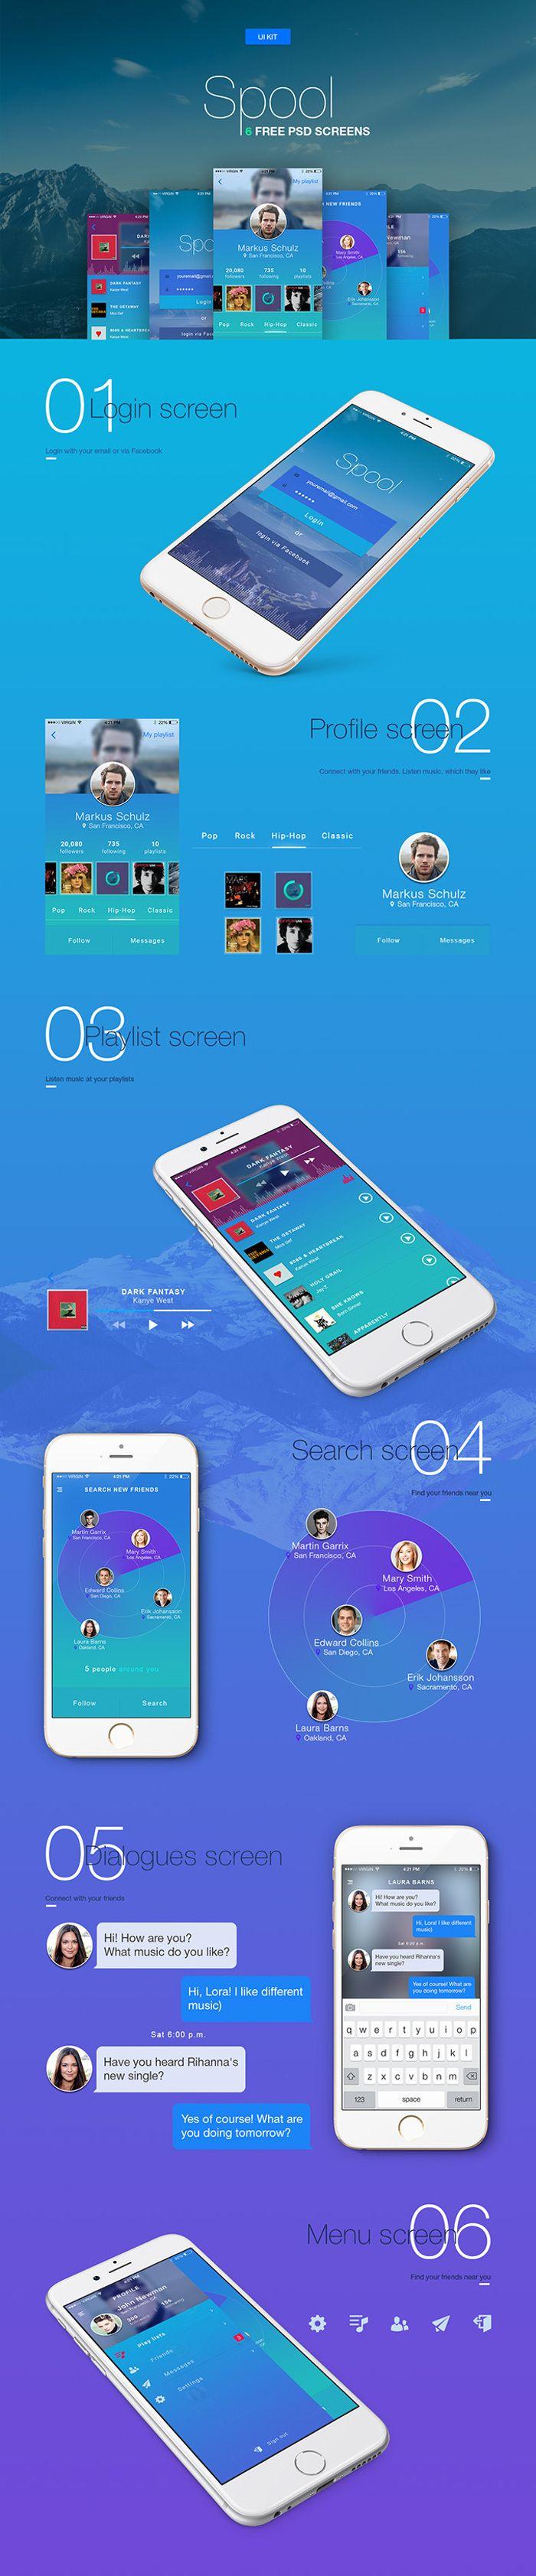 Spool: Free 6 Screens Mobile UI Templates by Sergey Malnik